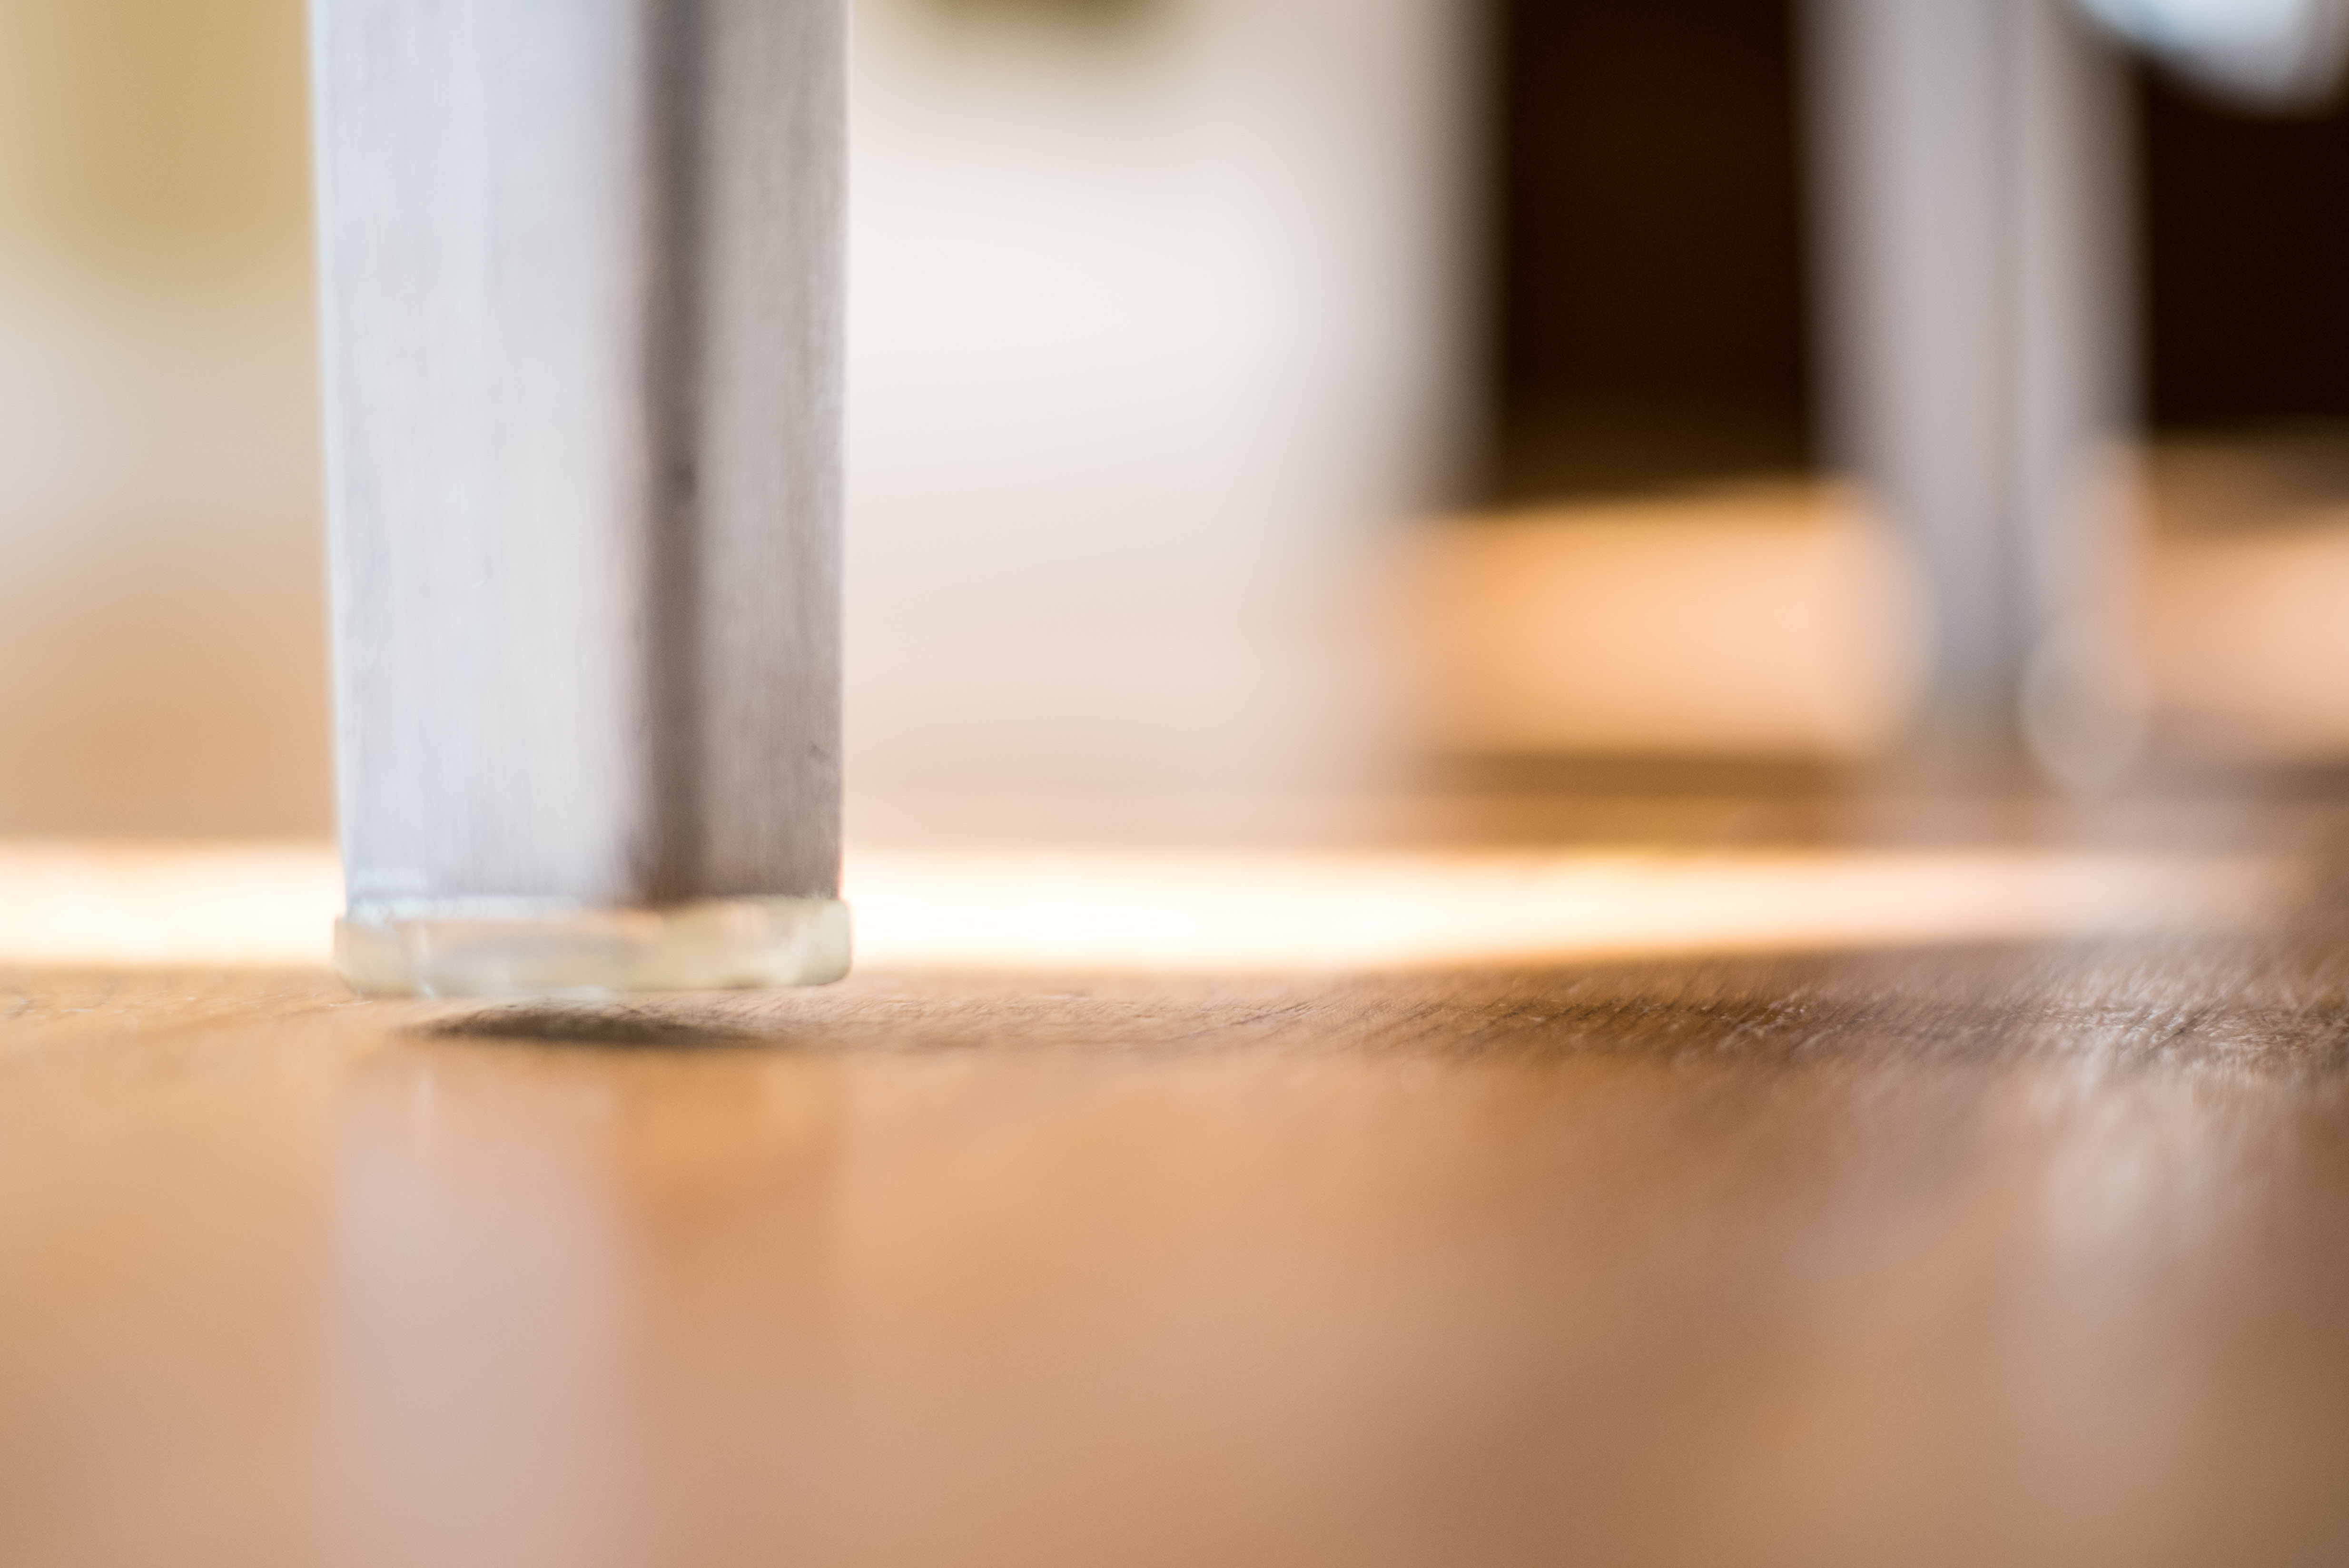 Philippe Starck Hand Brushed Aluminium Hudson Cafe Chairs by Emeco base 2